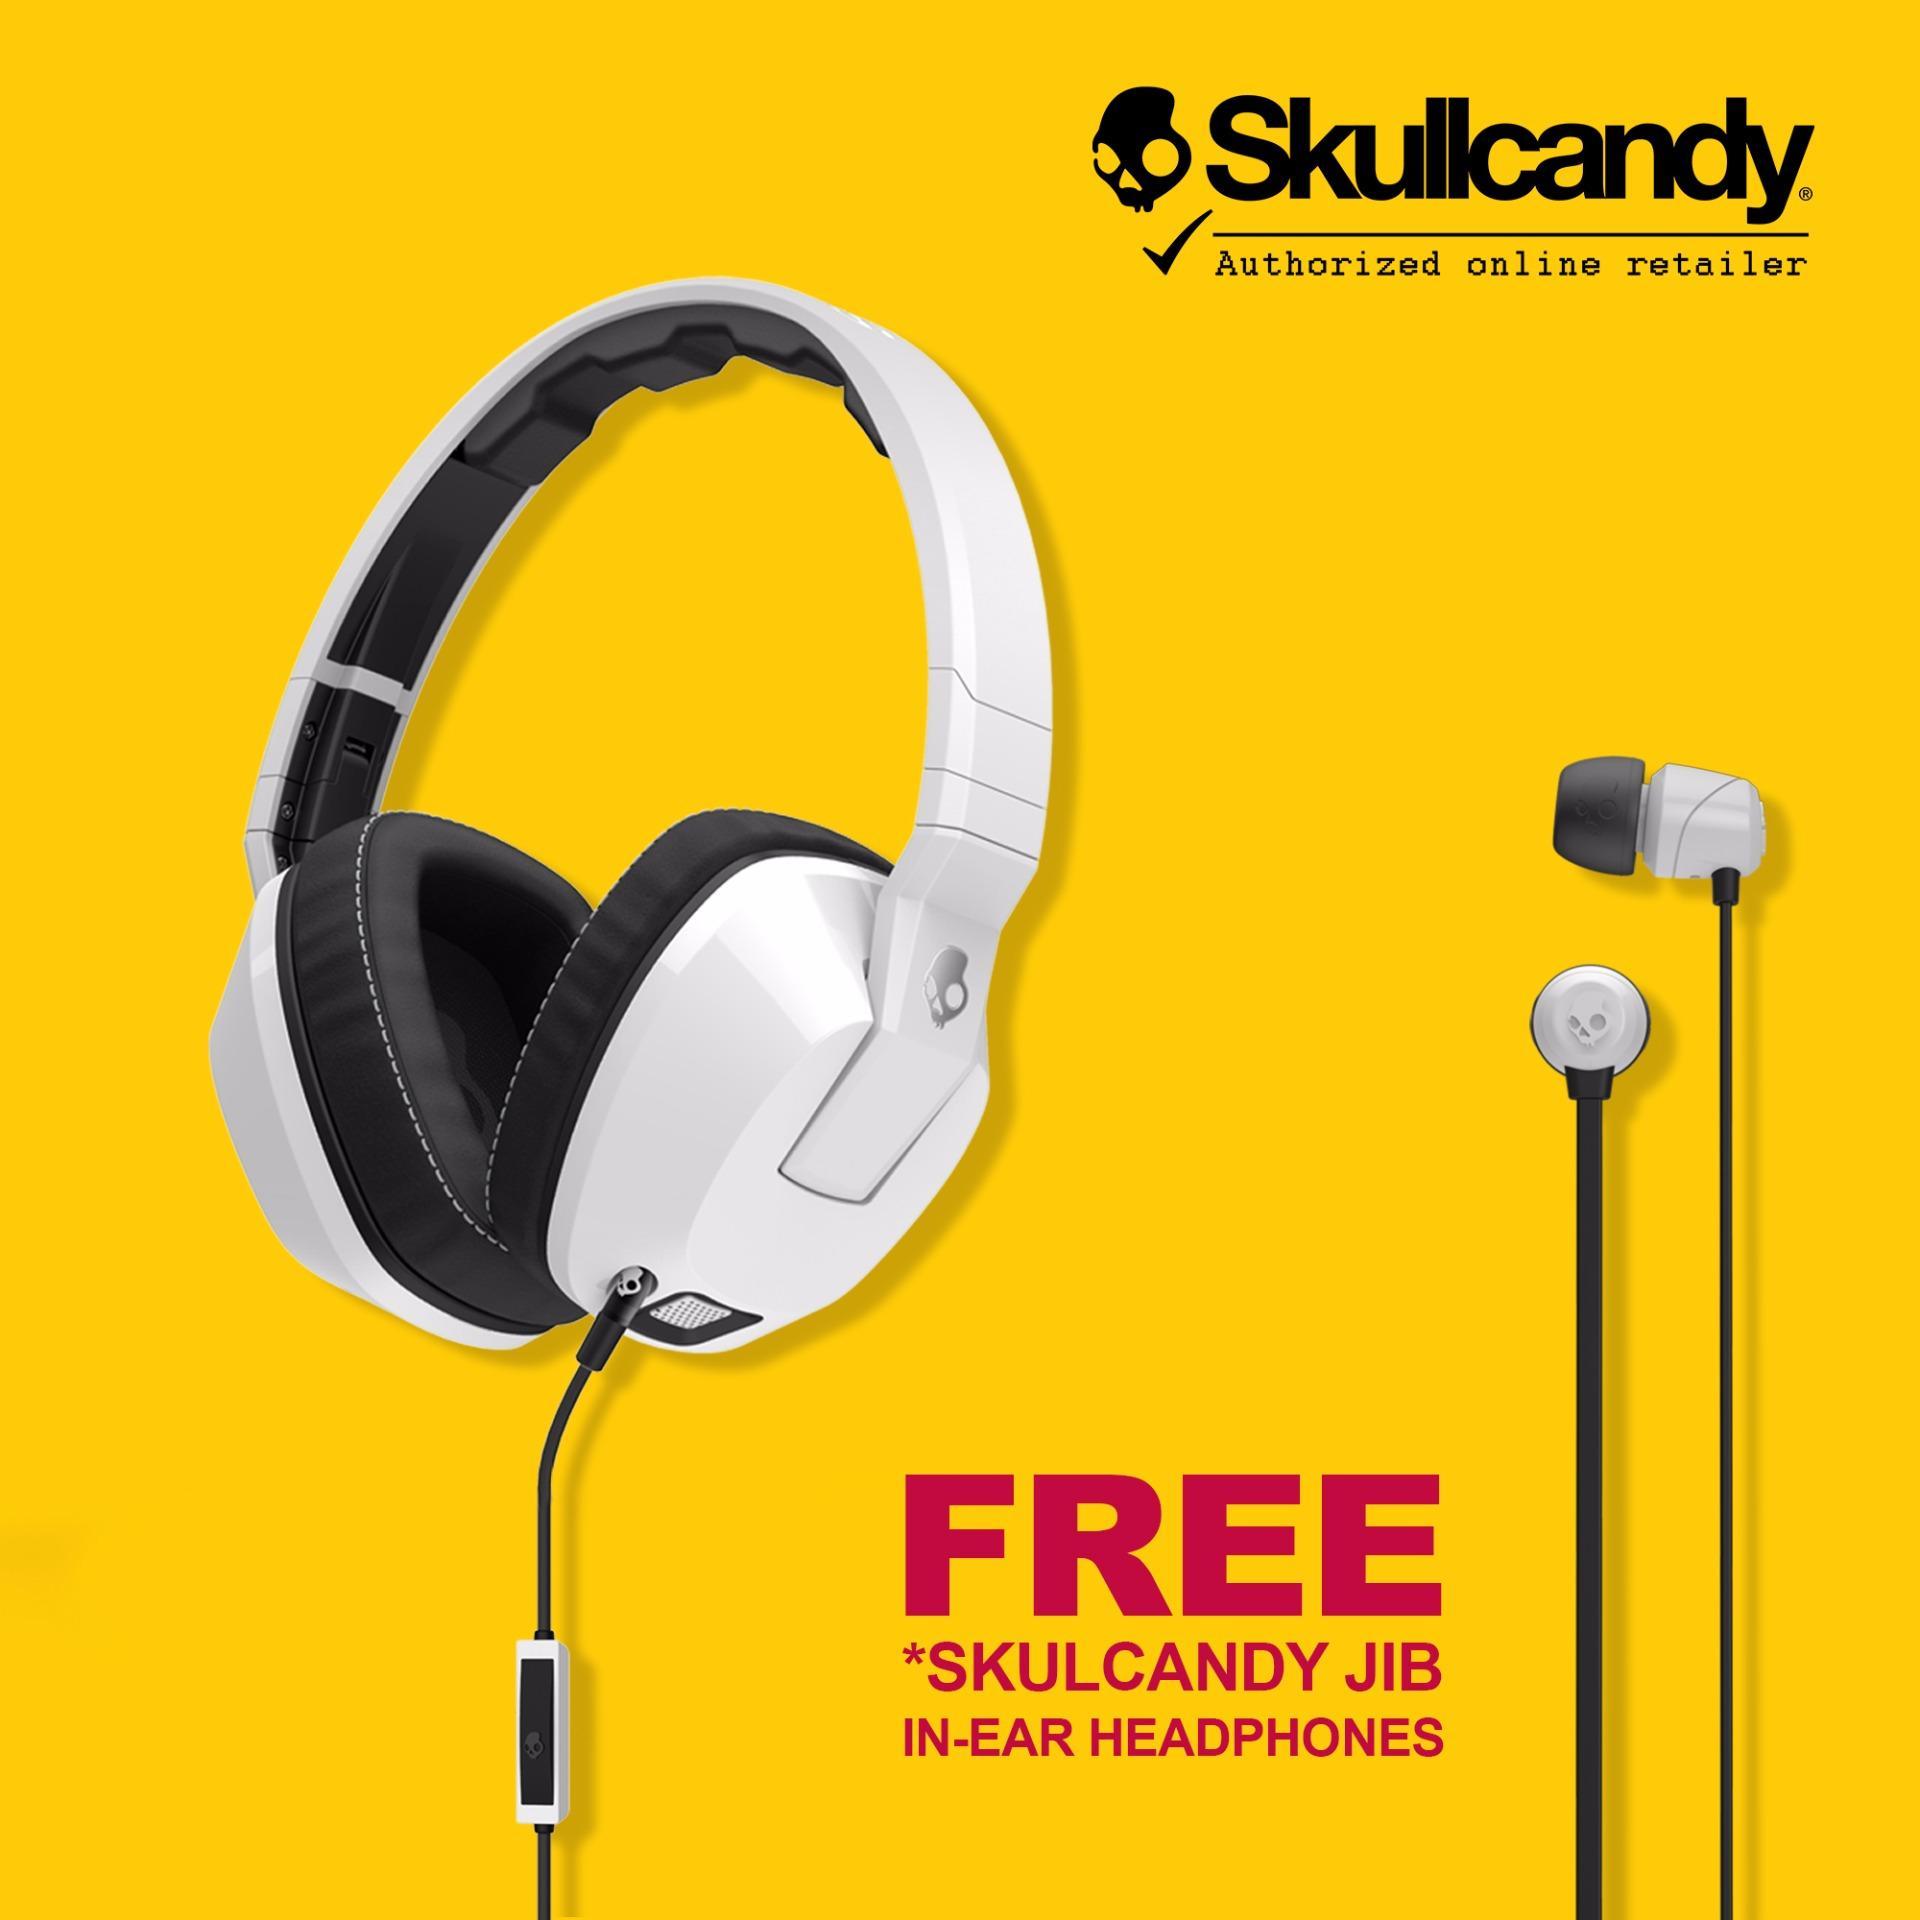 Skullcandy Crusher S6SCFZ-072 Over the Ear Headphones with FREESkullcandy S2DUDZ-